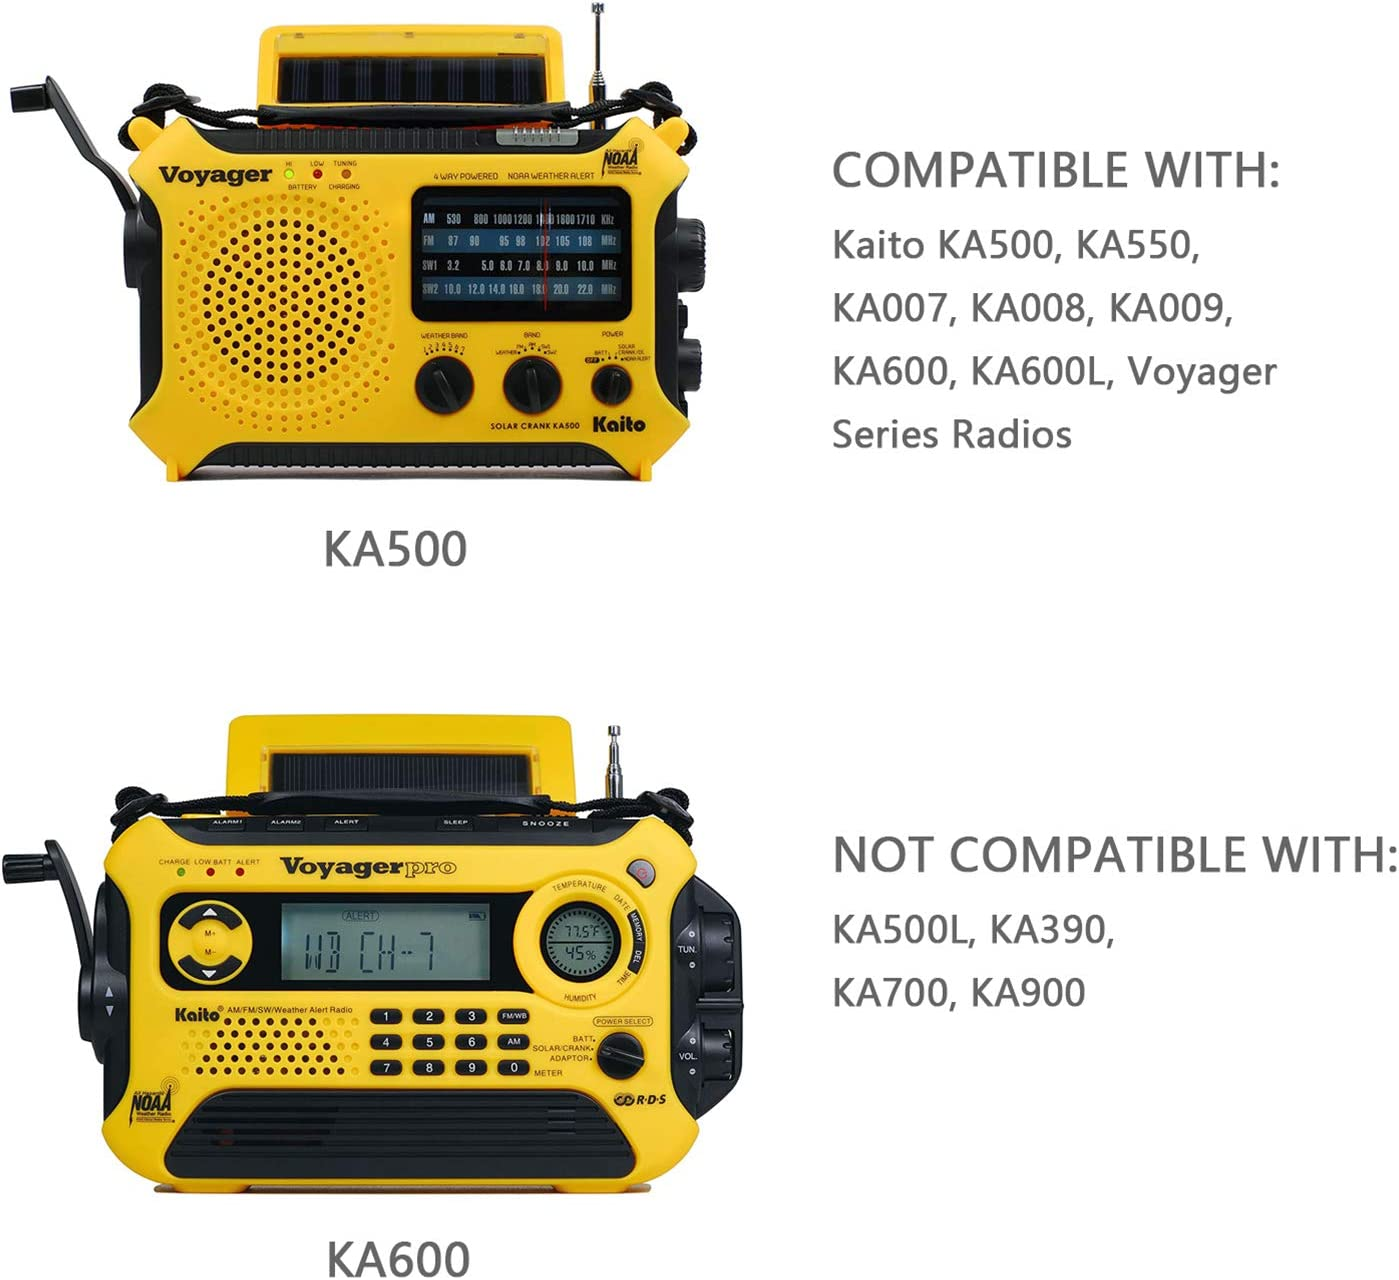 AC/DC 6V Adapter Compatible with for Kaito Voyager Series Radios, Replacement AD-500 Power Supply Charger Cord for KA500 KA600 KA007 KA008 KA009 and More (10 FT): Home Audio & Theater